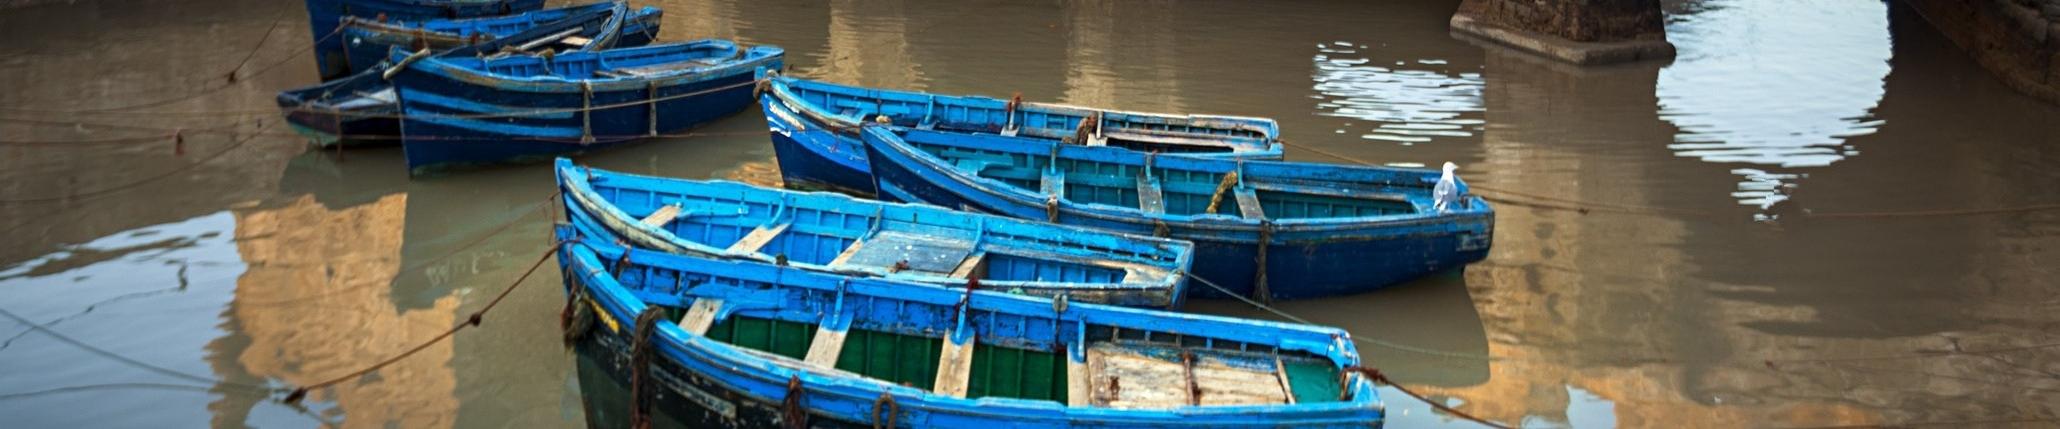 Voyage a Essaouira